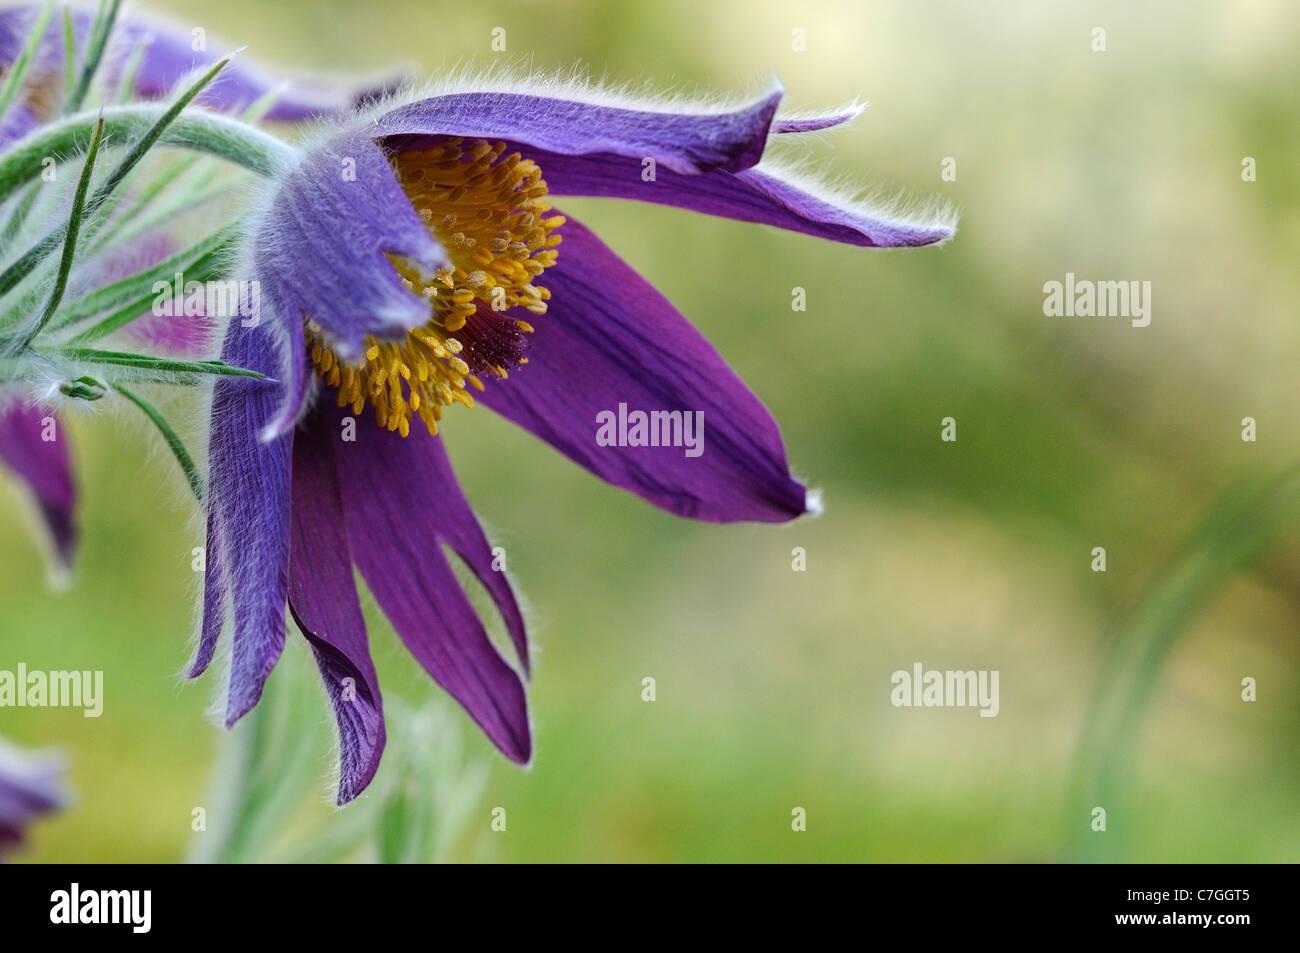 Pulsatilla or Pasque Flower (Pulsatilla vulgaris) Oxfordshire, UK - Stock Image